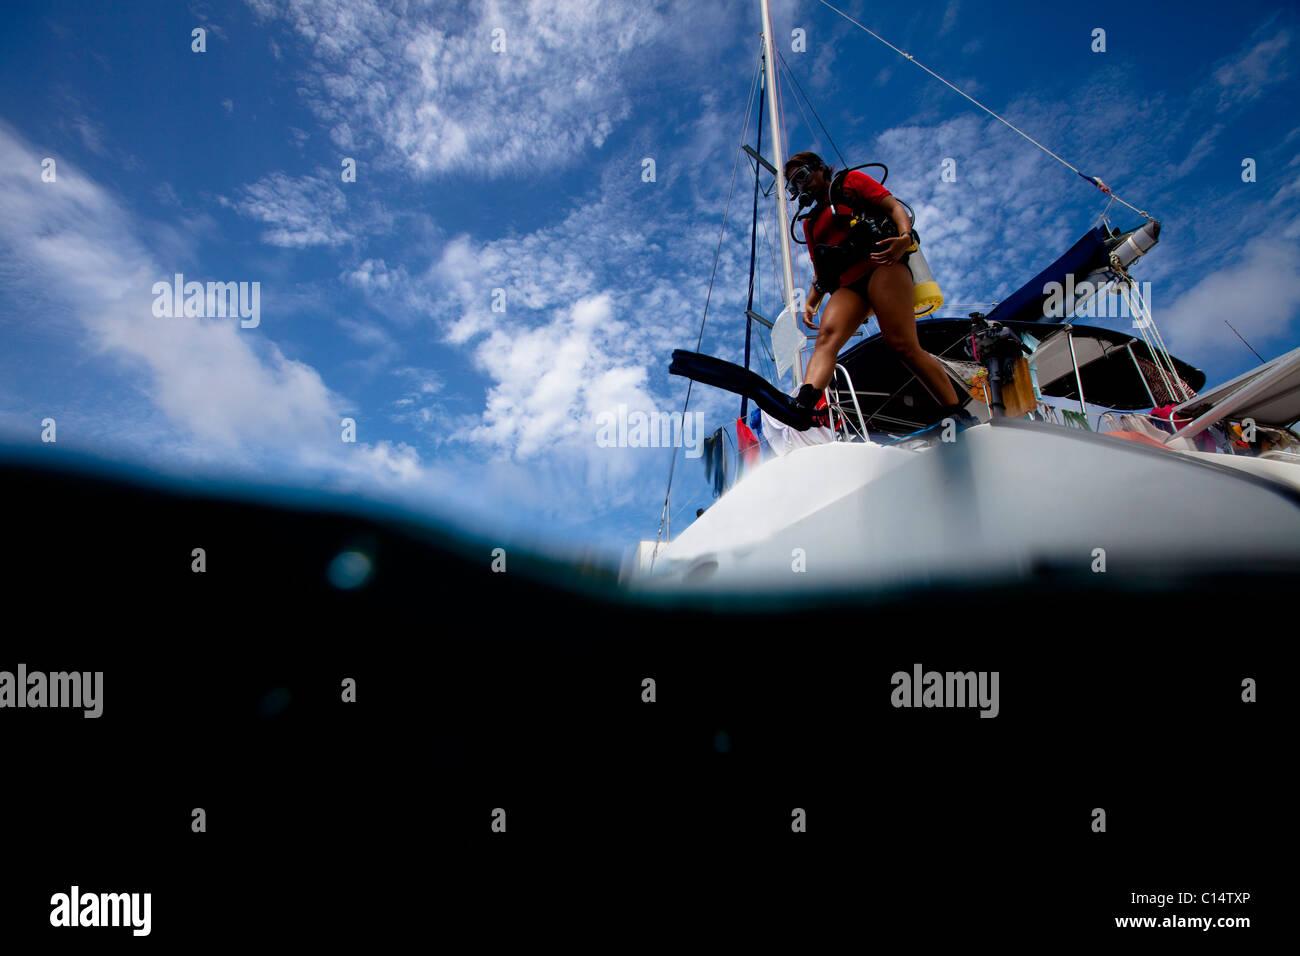 A young Hispanic woman in scuba gear jumps off a catamaran. - Stock Image